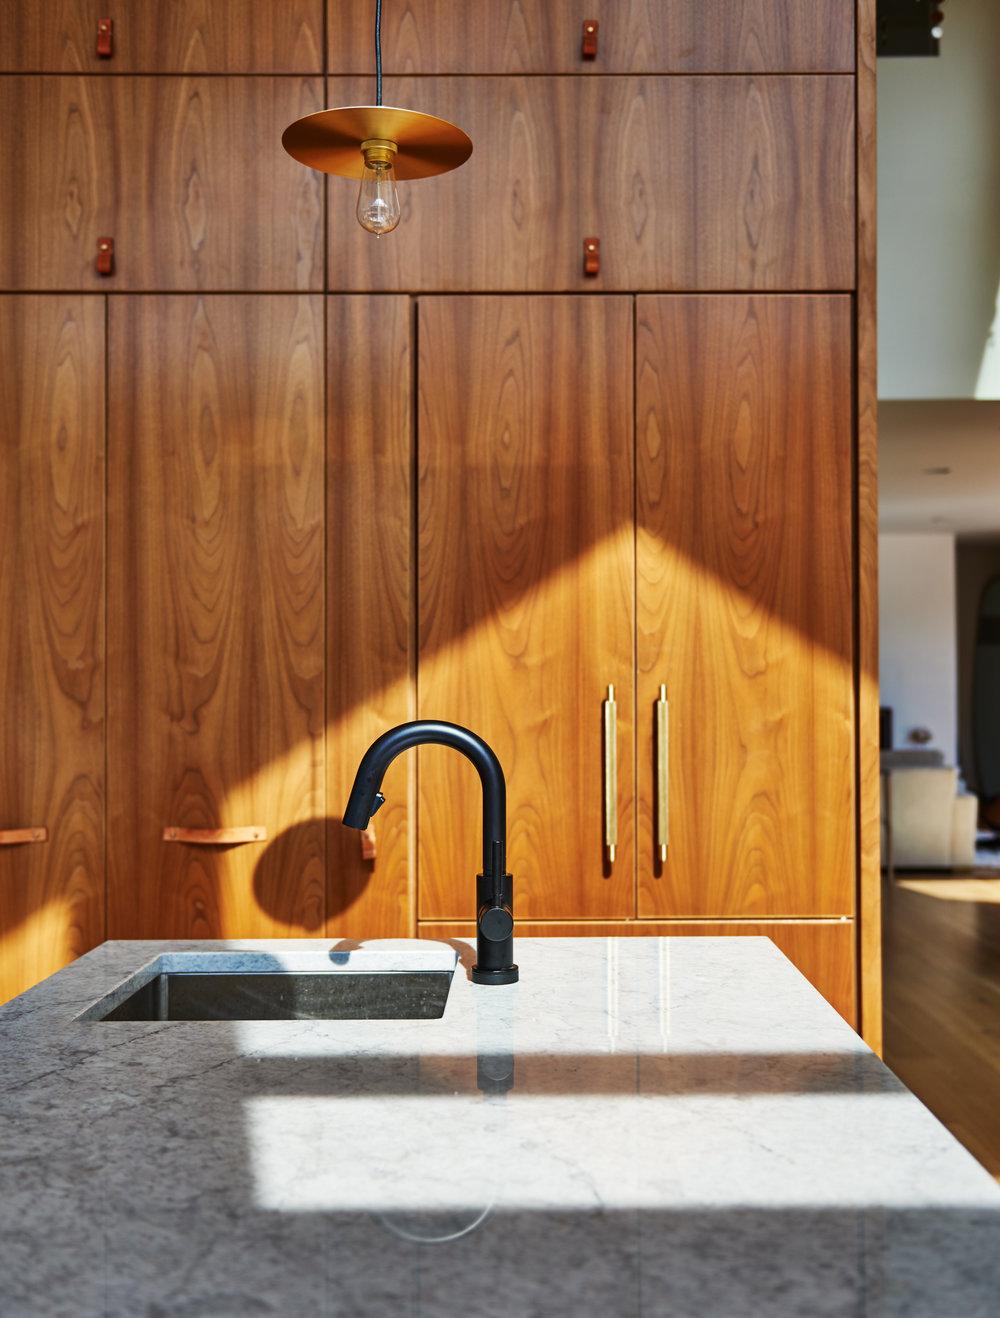 Black Brizo faucet